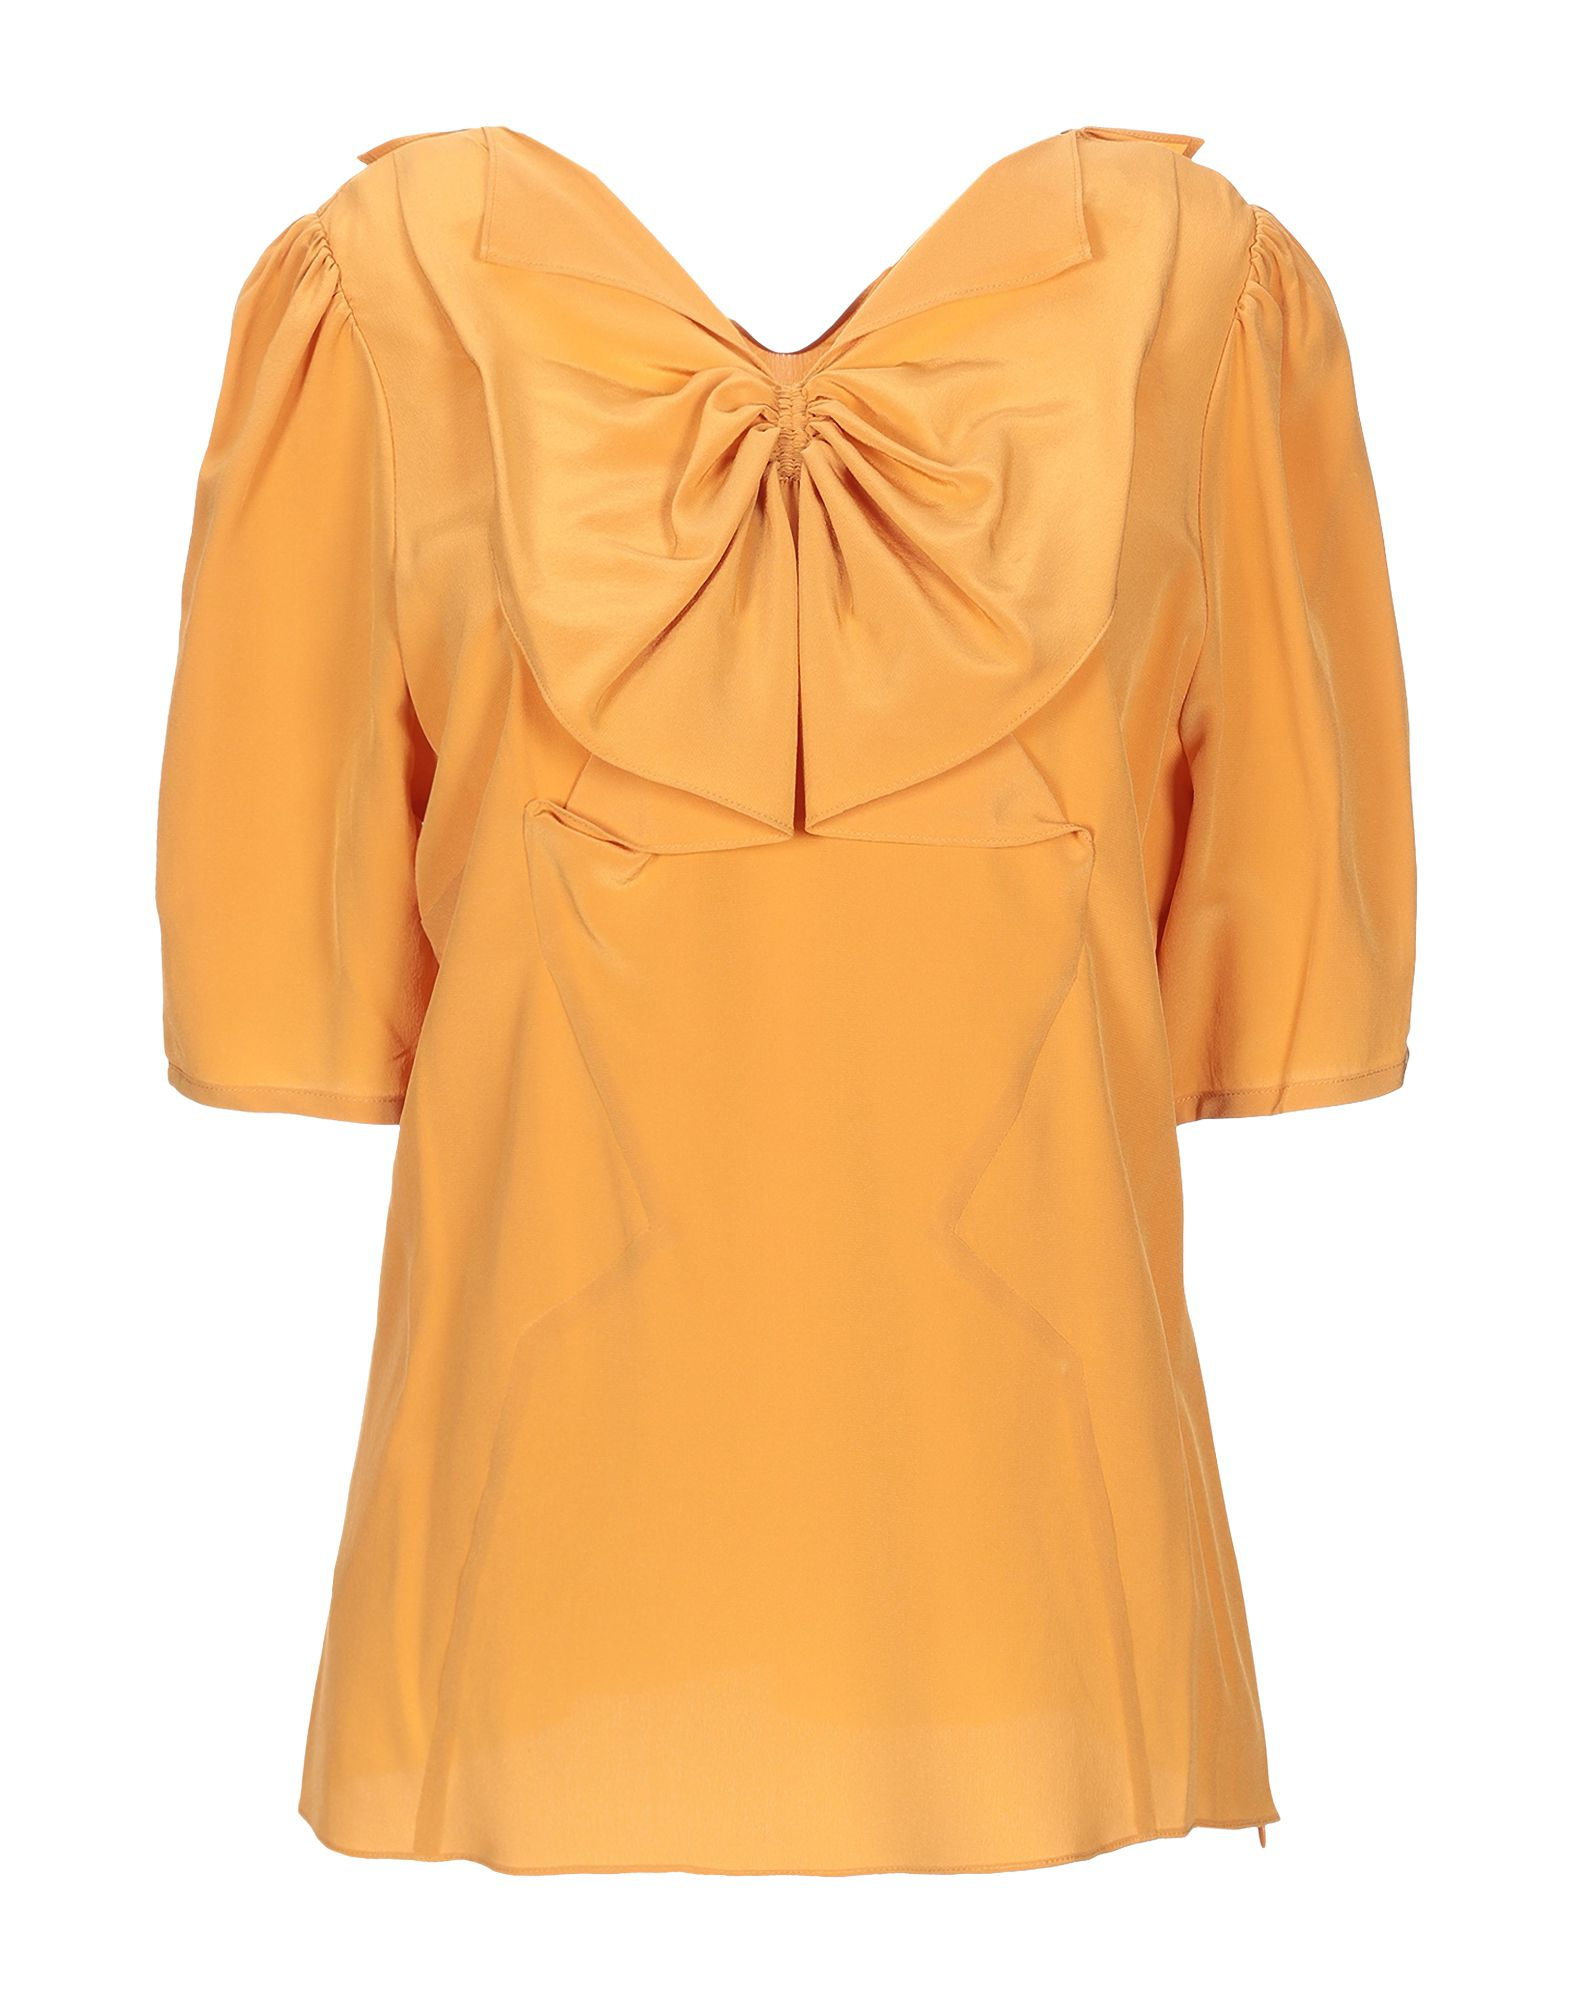 MIGUEL PALACIO for HOSS INTROPIA Блузка цена и фото